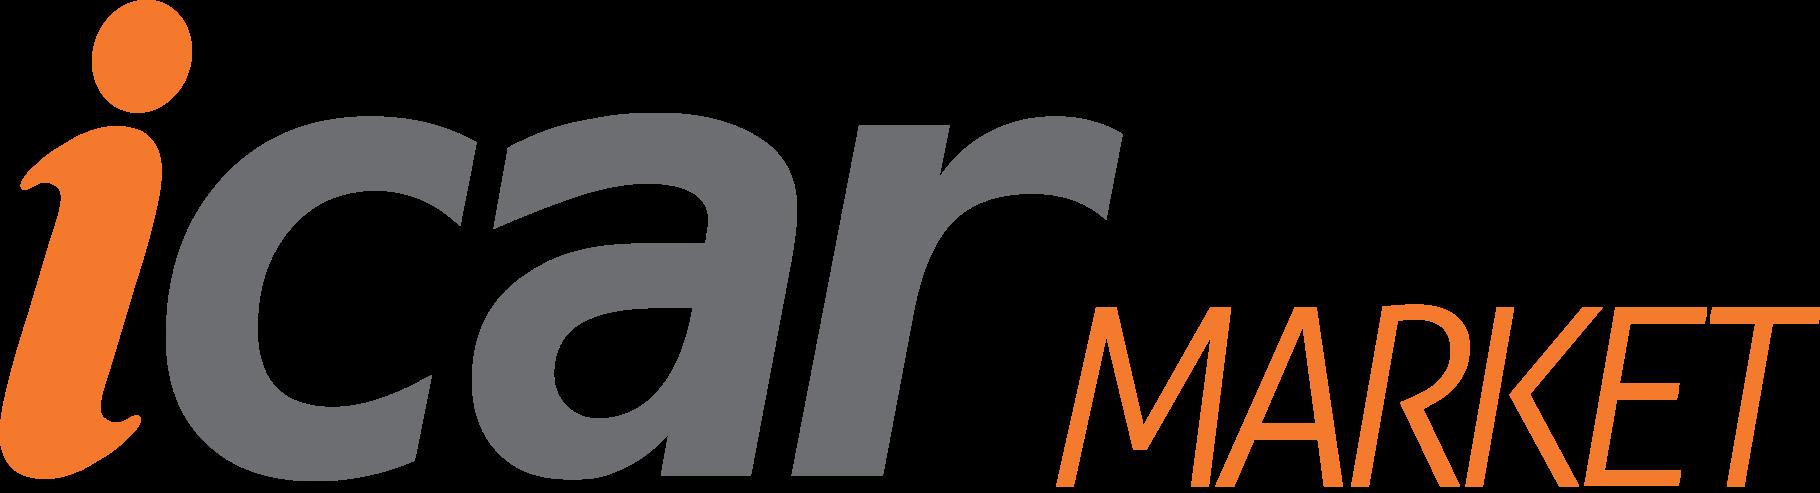 icar market logo